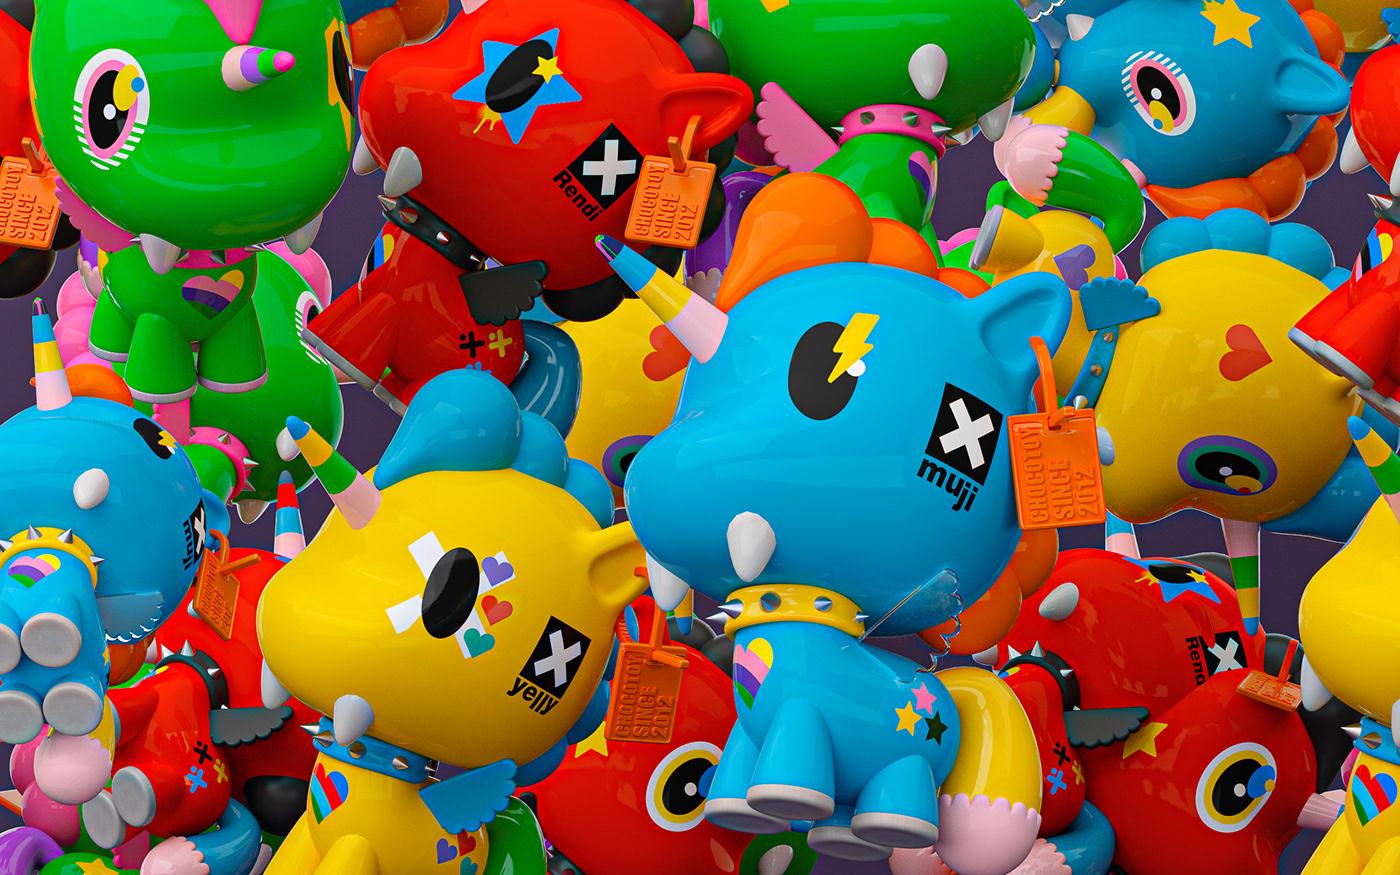 Image may contain: cartoon, screenshot and colorful